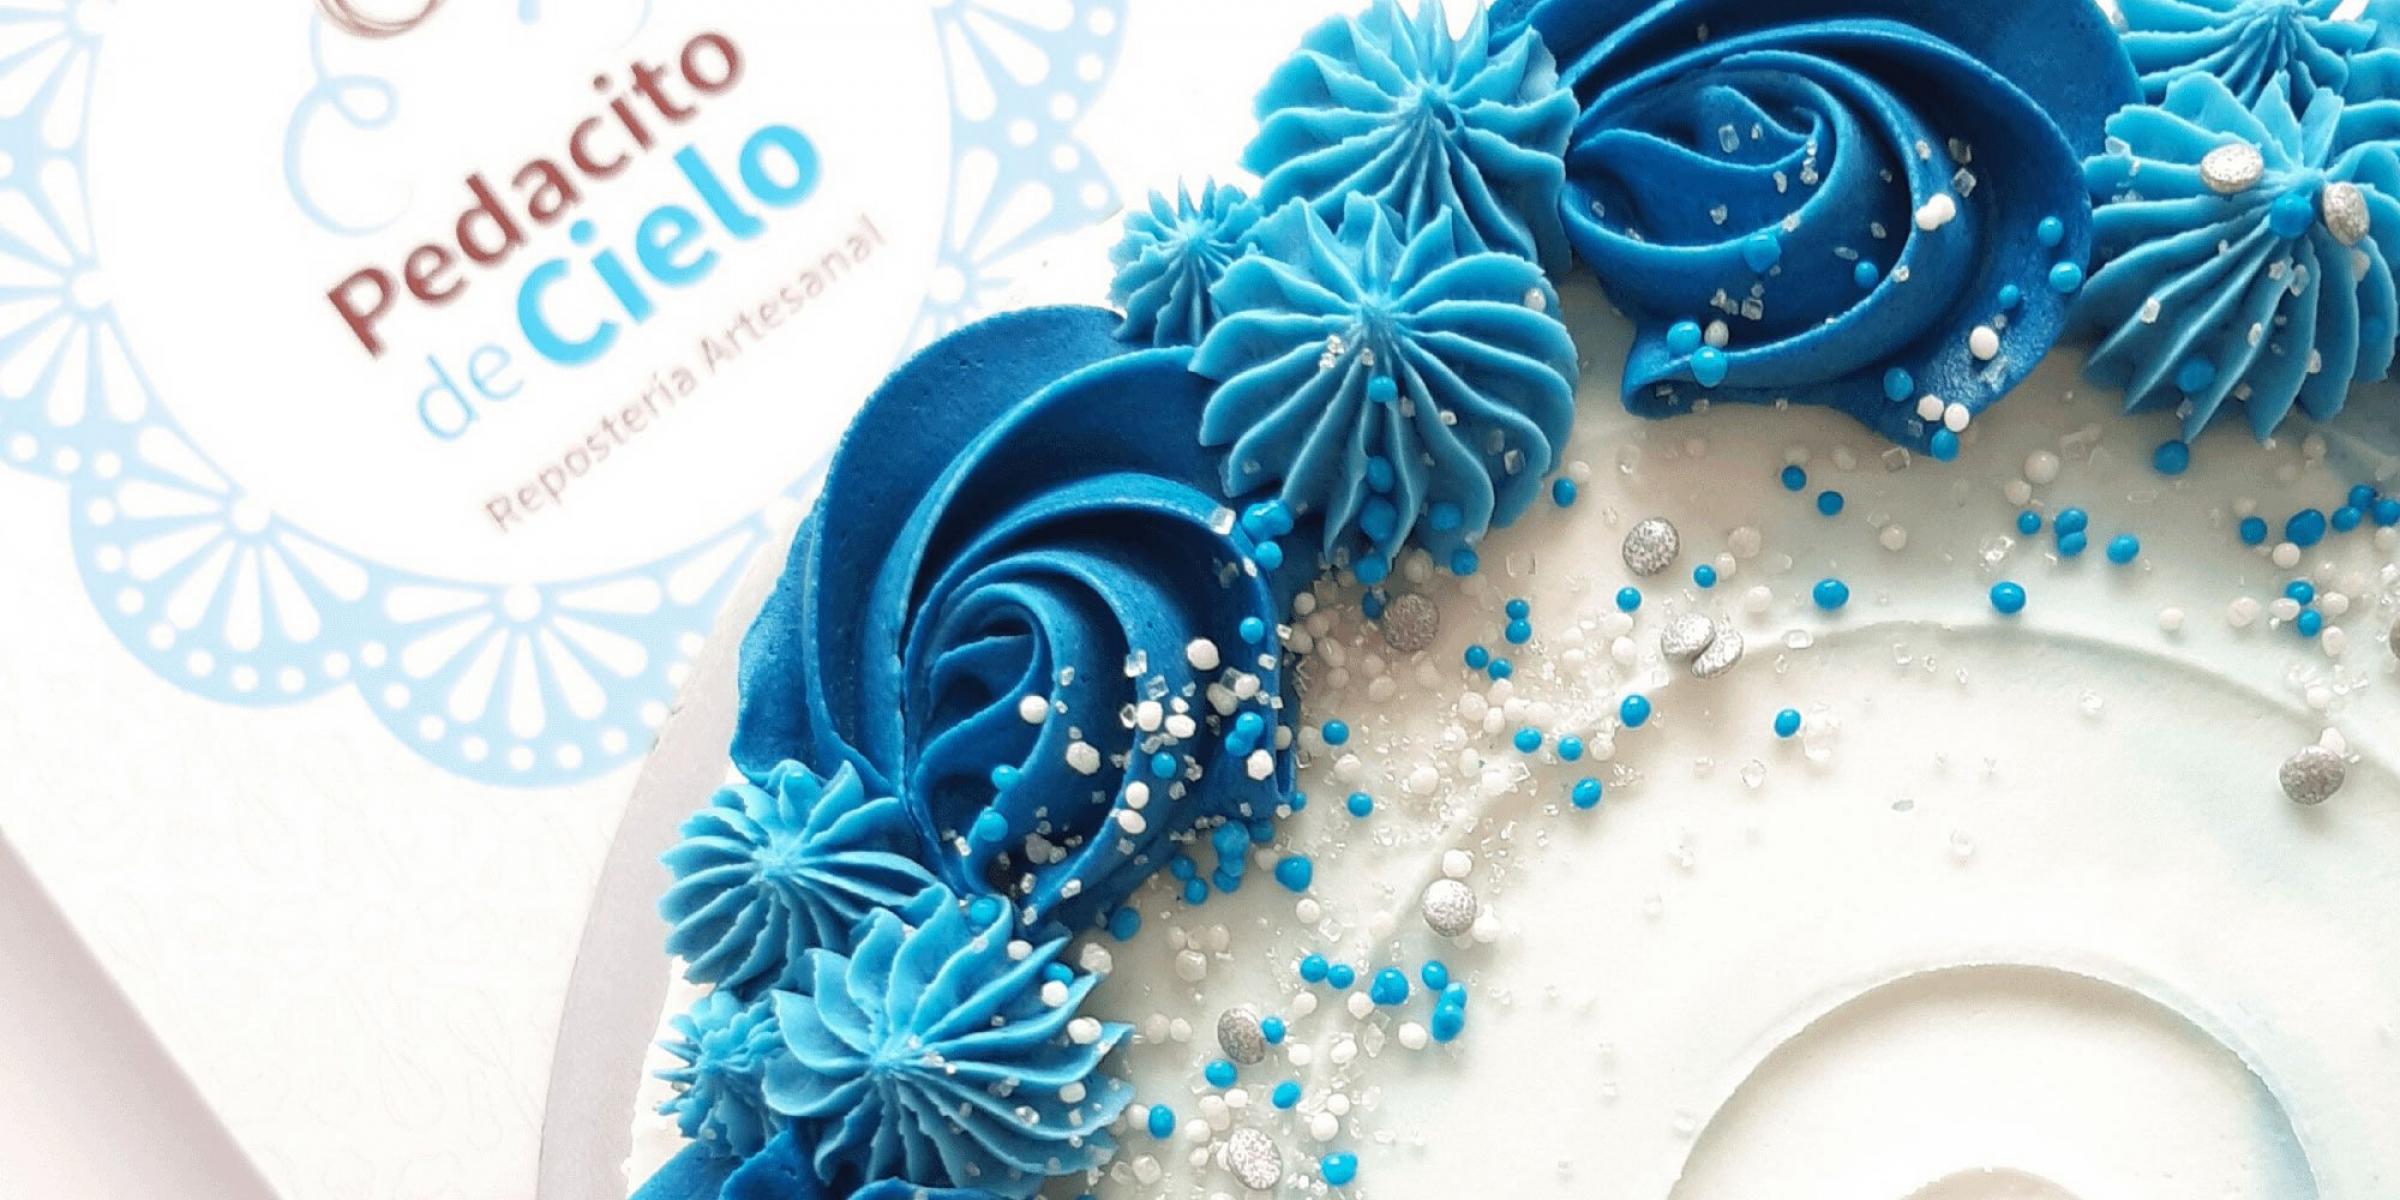 hero-2-buttercream-azul-opt